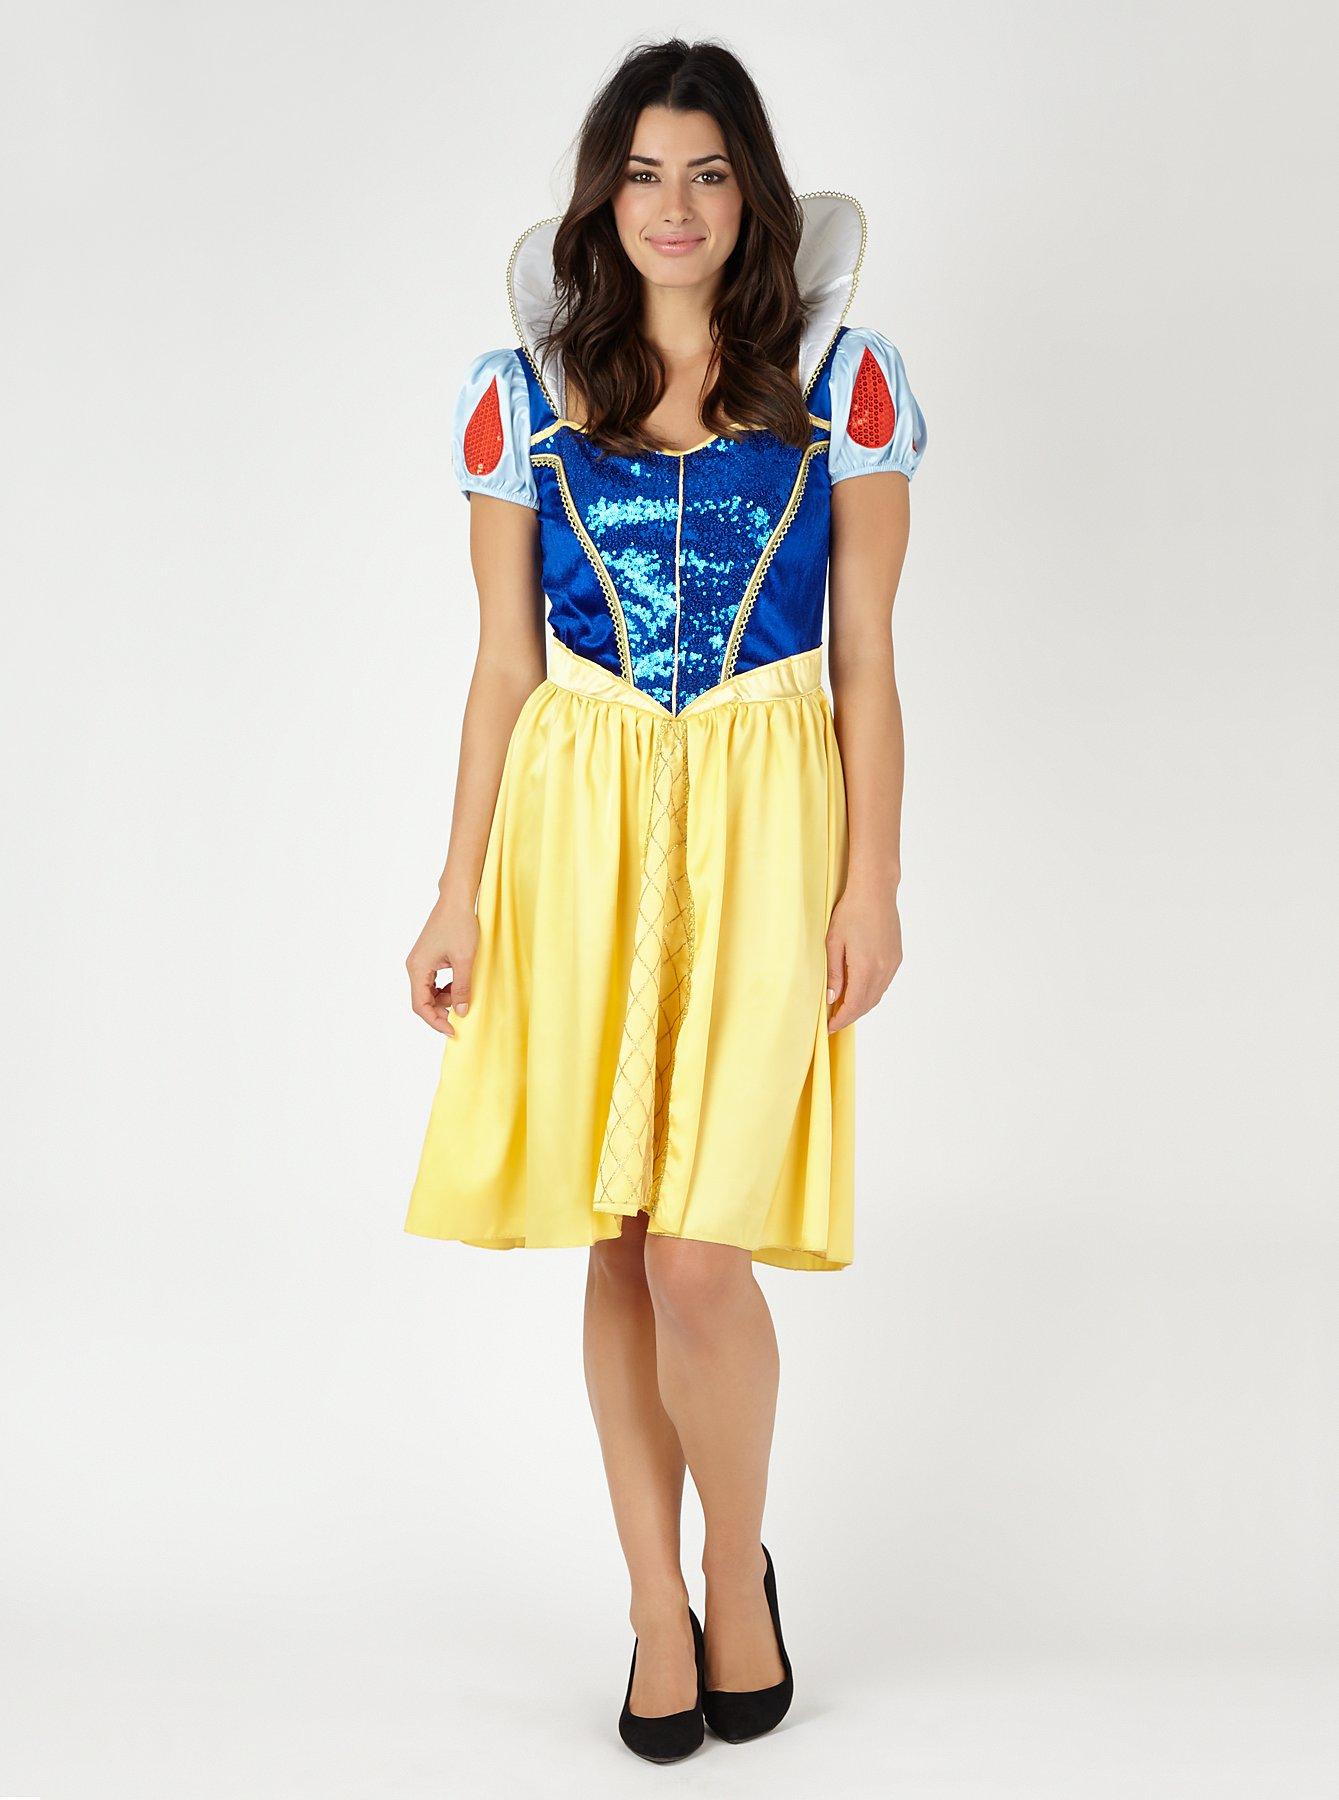 Ladies leather gloves asda - Adult Disney Snow White Fancy Dress Costume